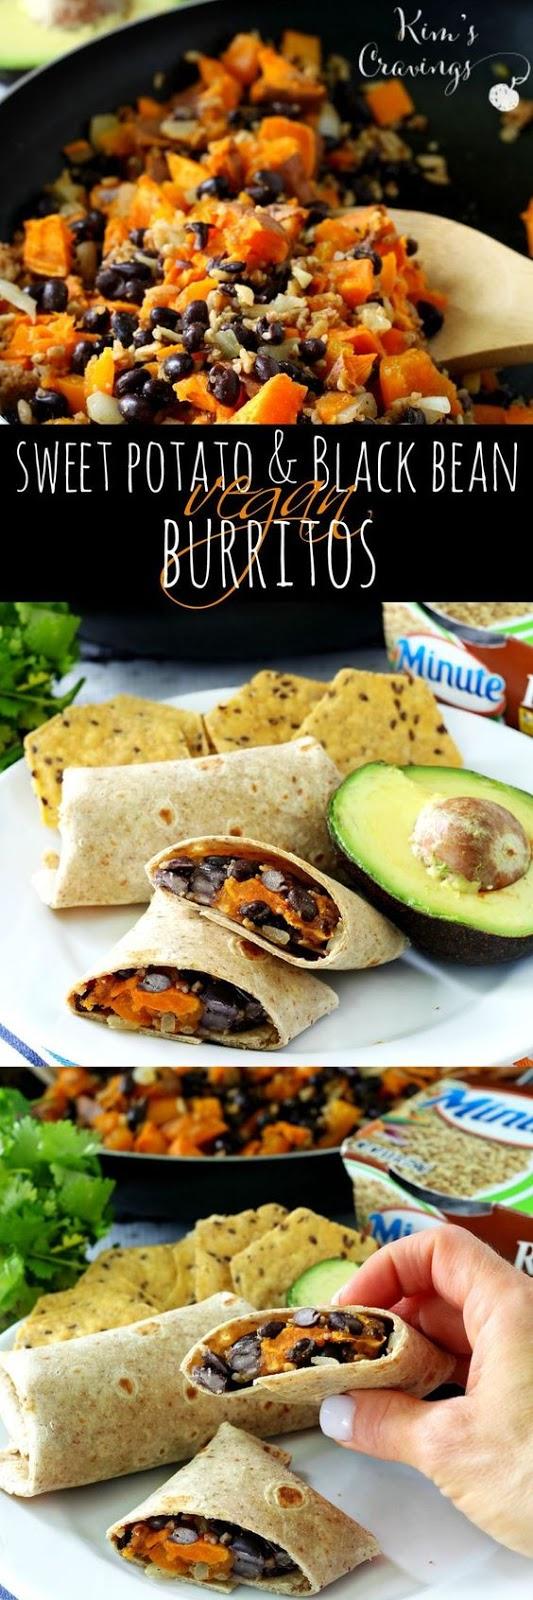 Sweet Potato and Black Bean Vegan Burritos